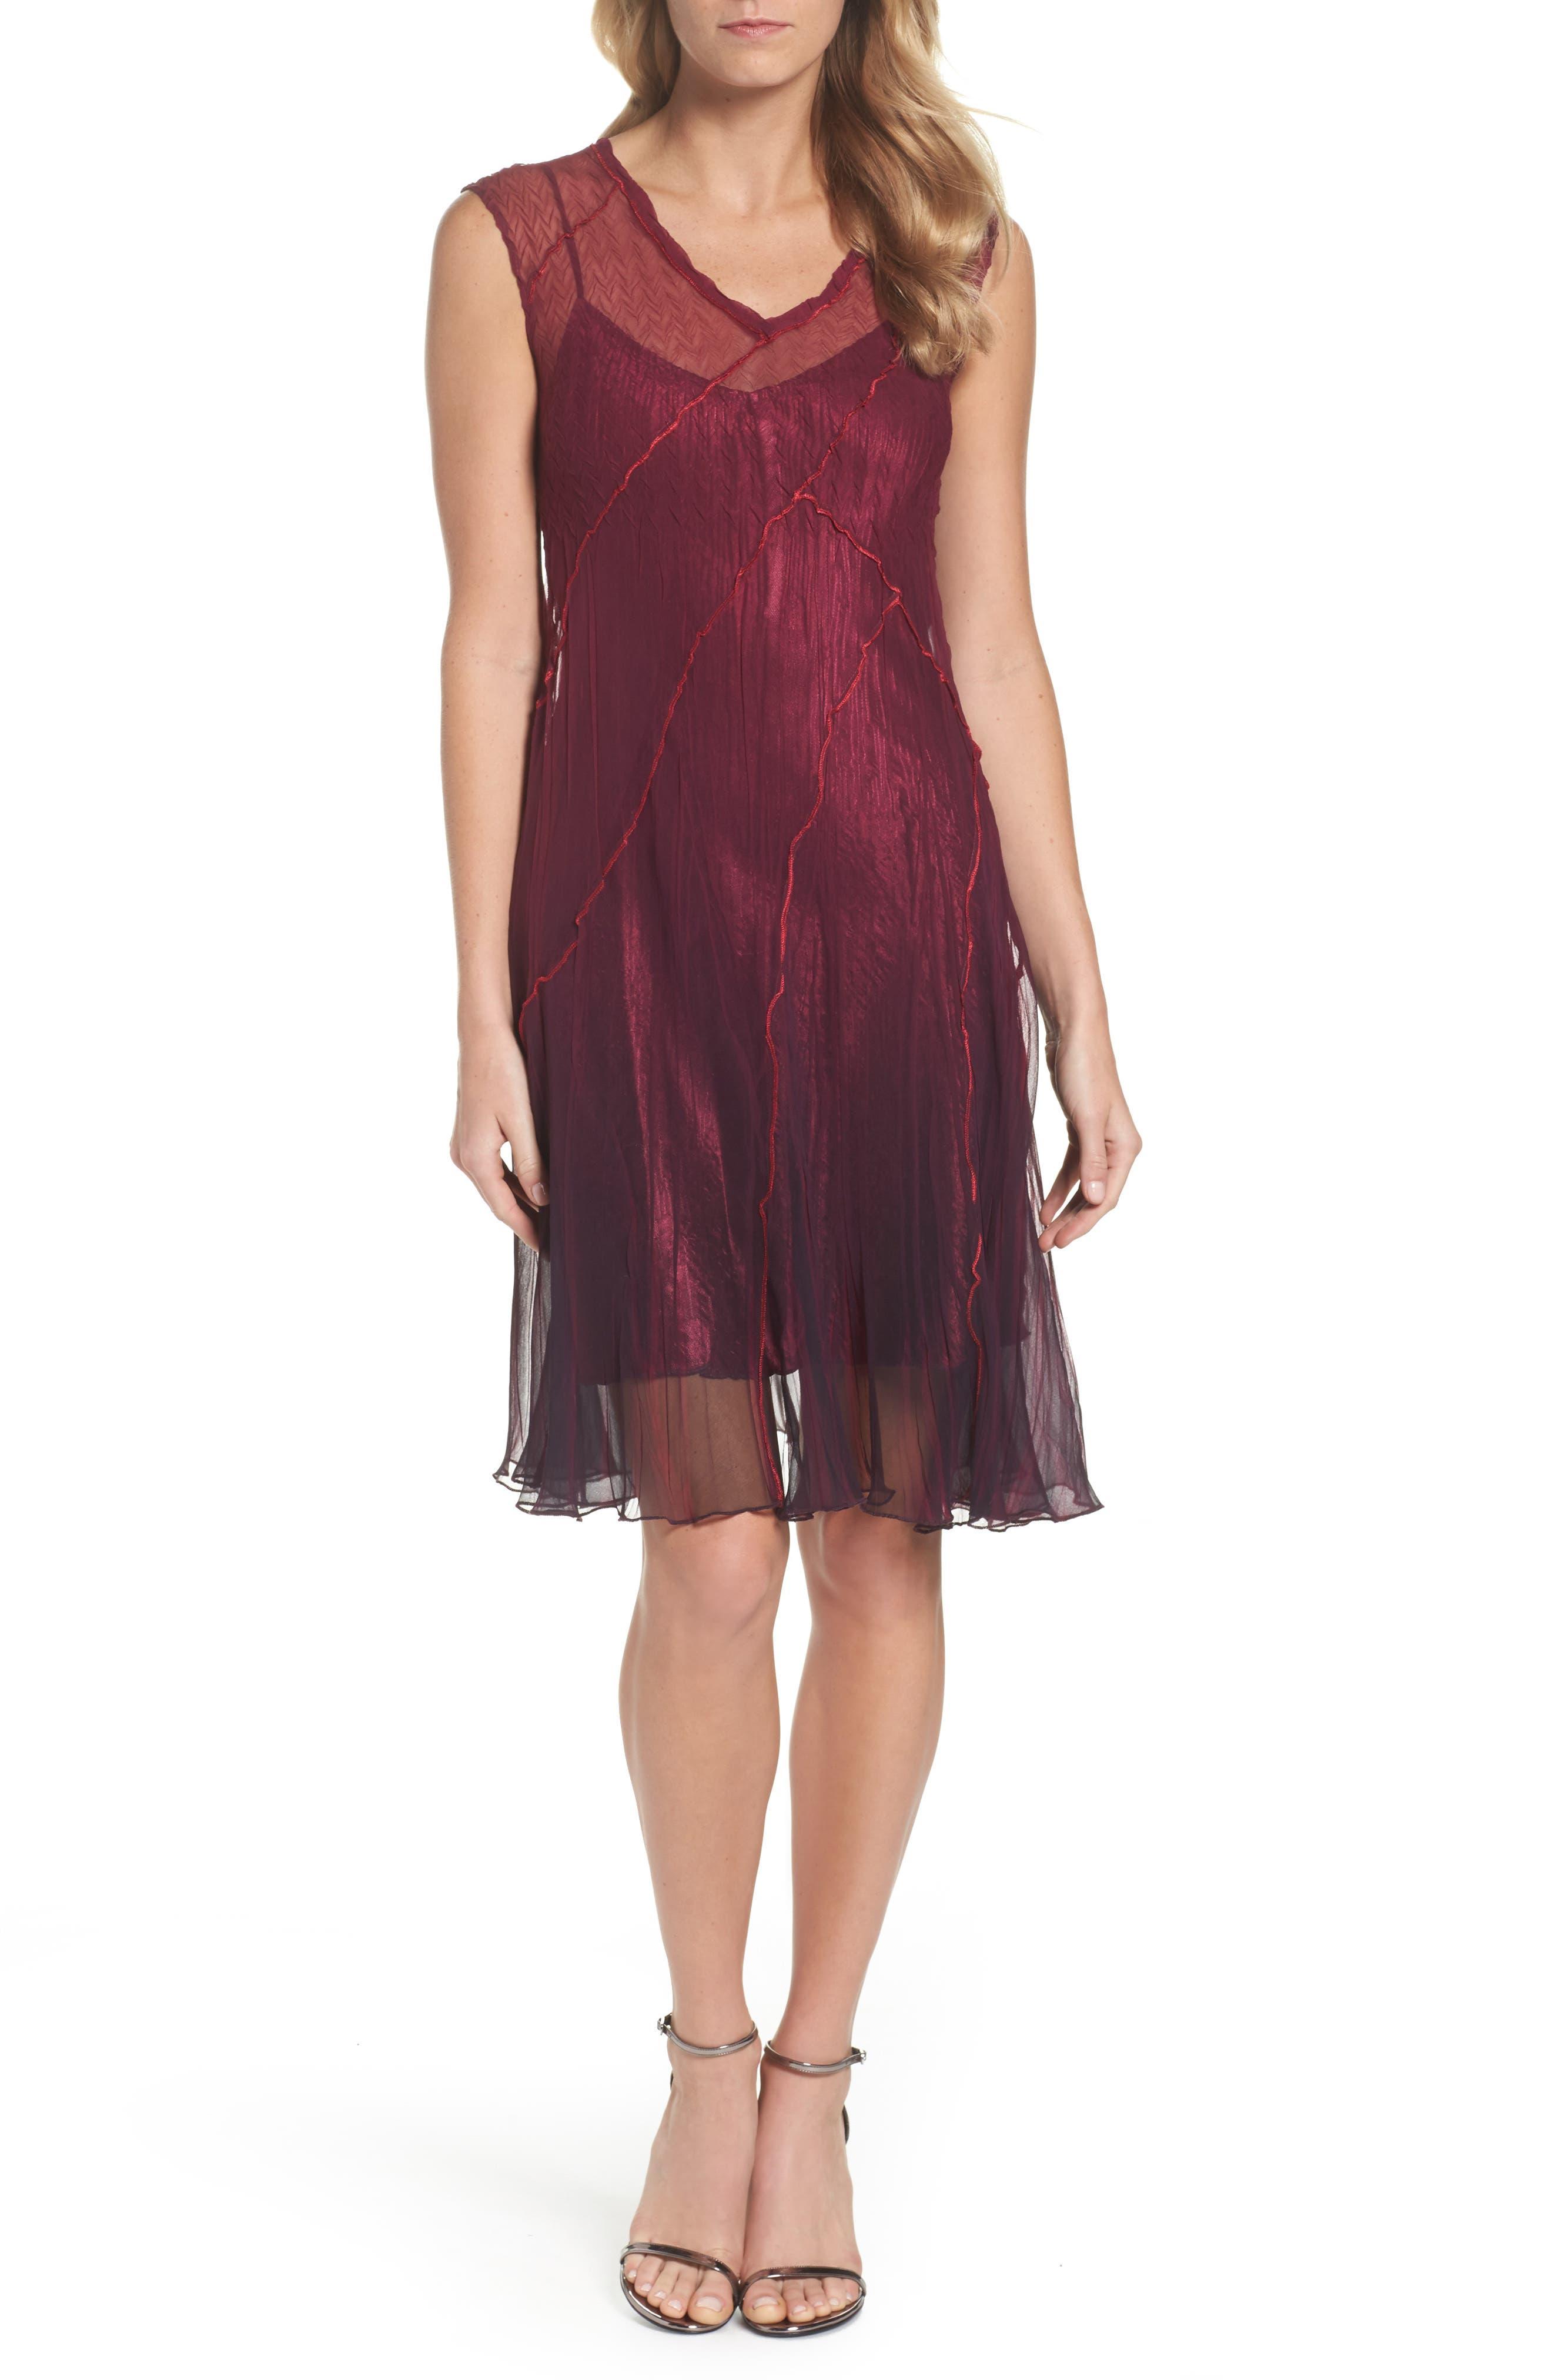 Chiffon A-Line Dress,                         Main,                         color, Red Plum Blue Ombre